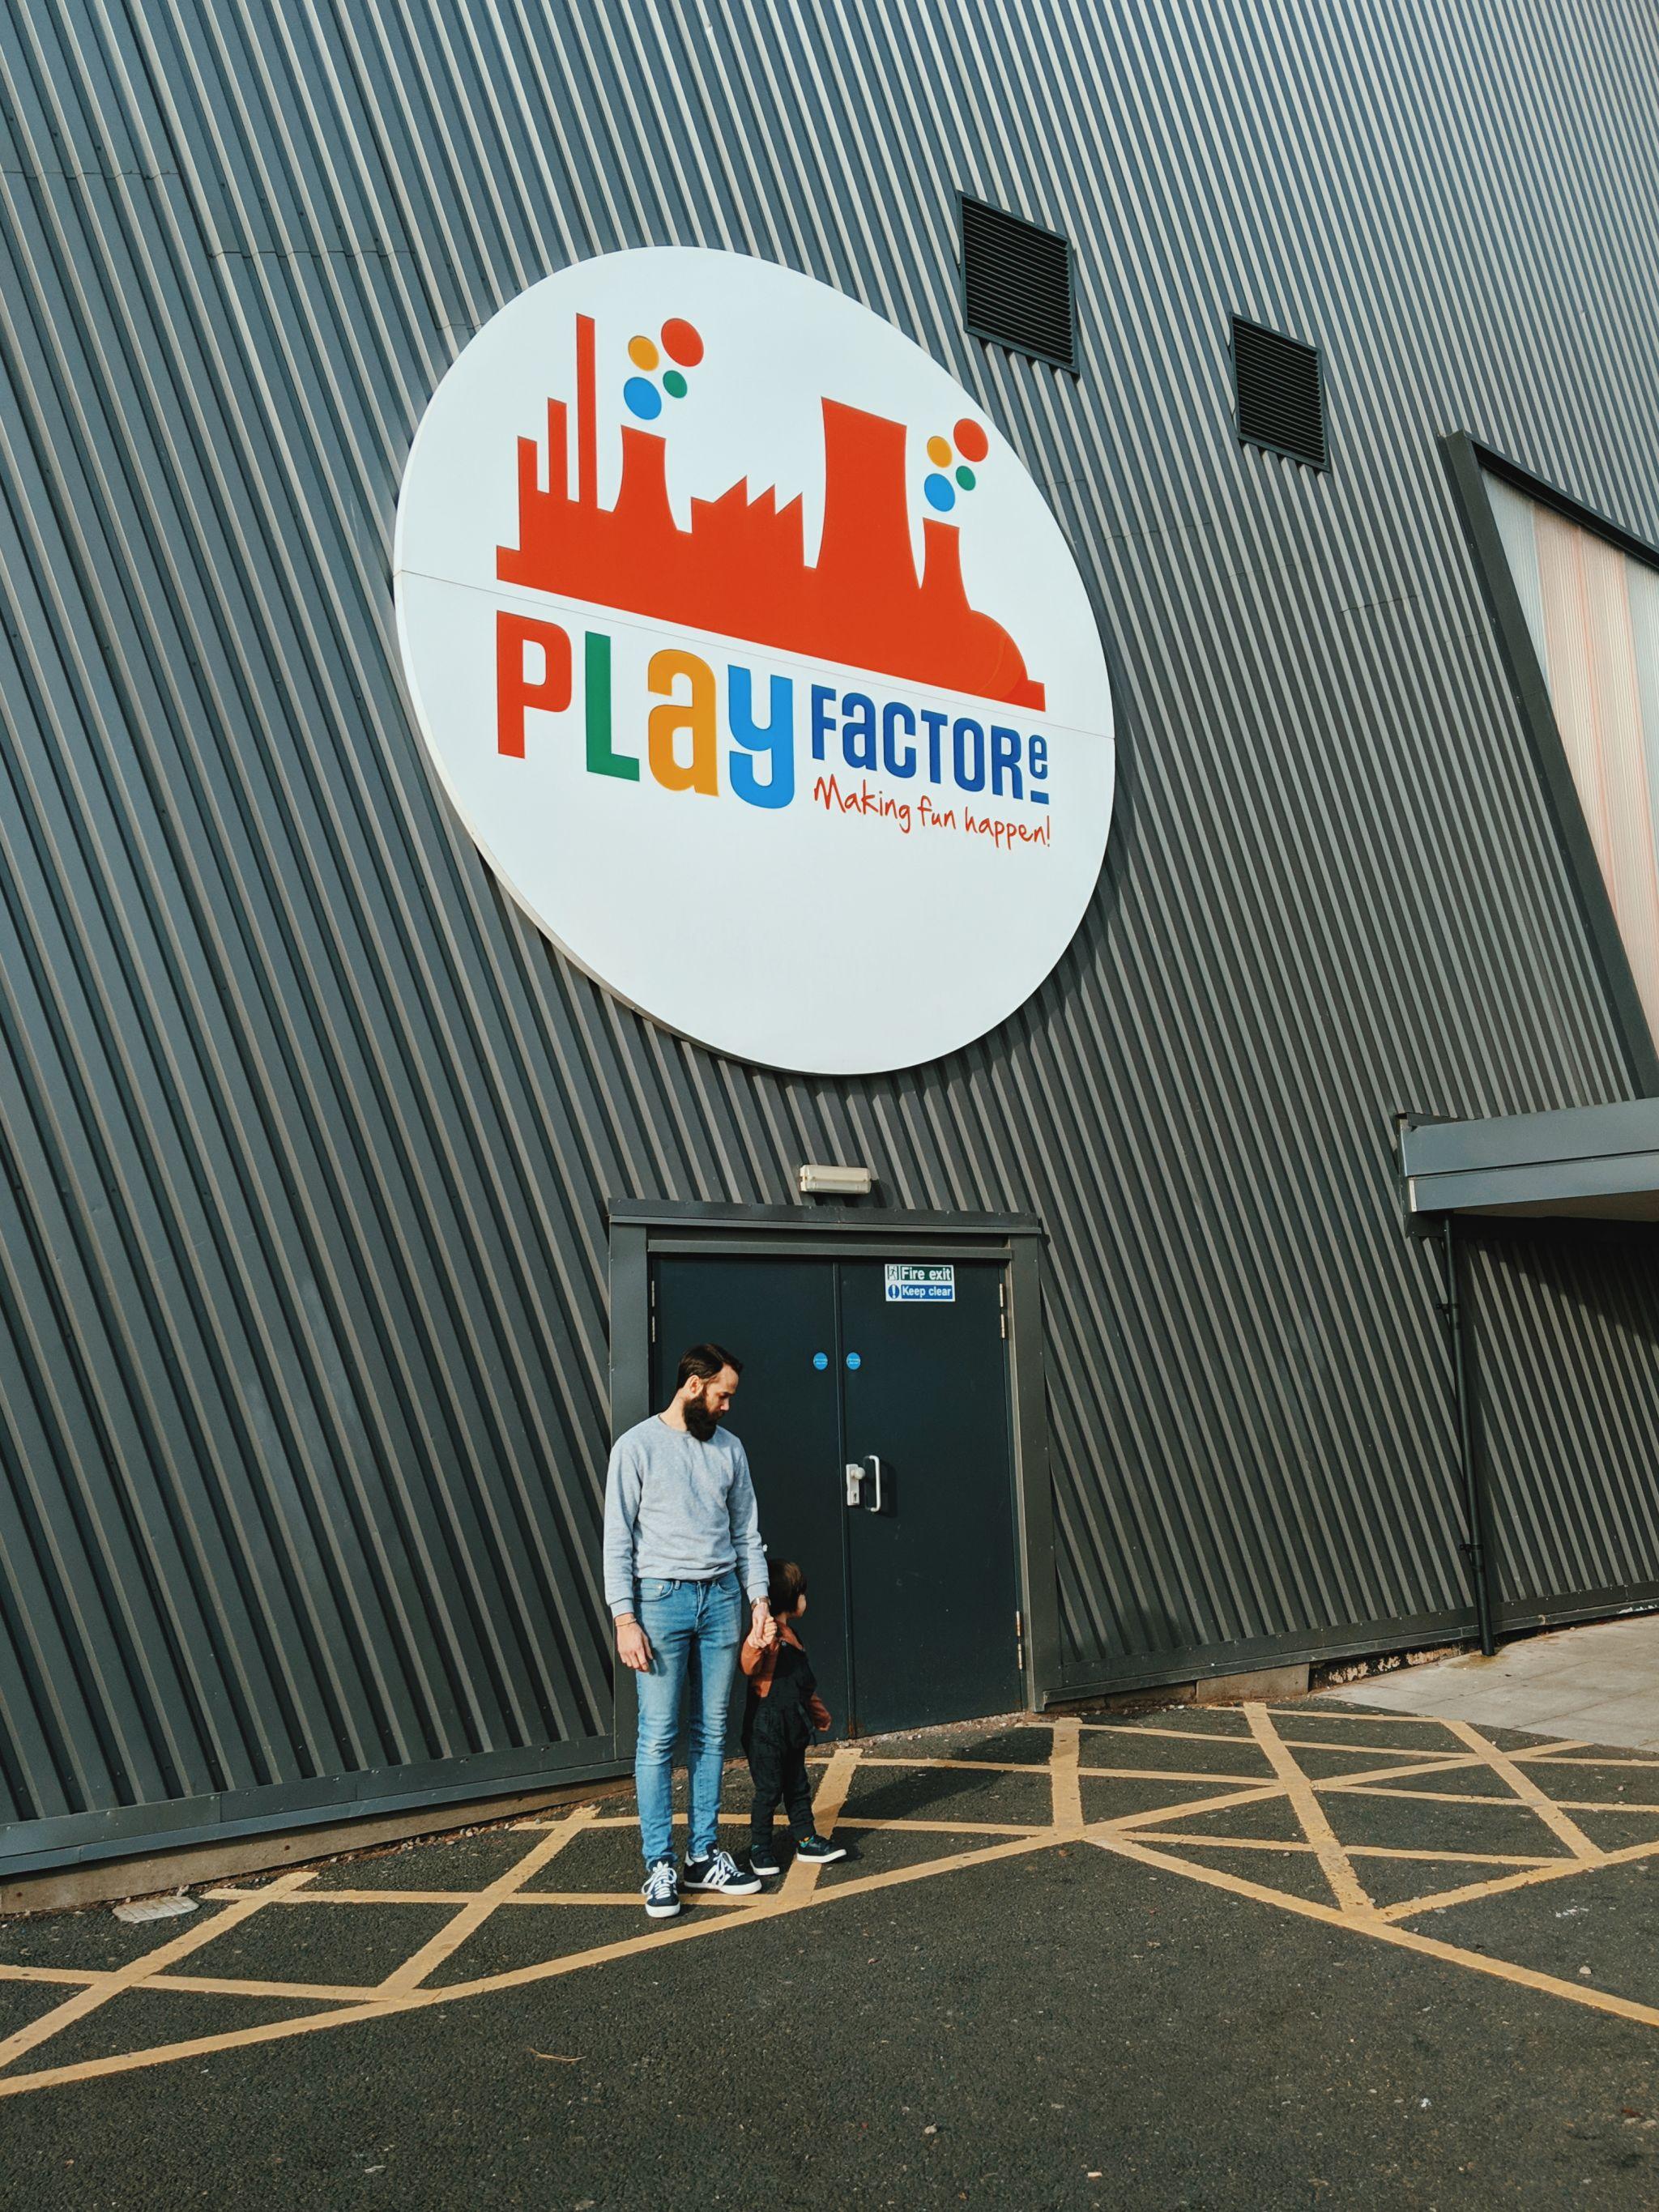 Play Factore Beyond Manchester